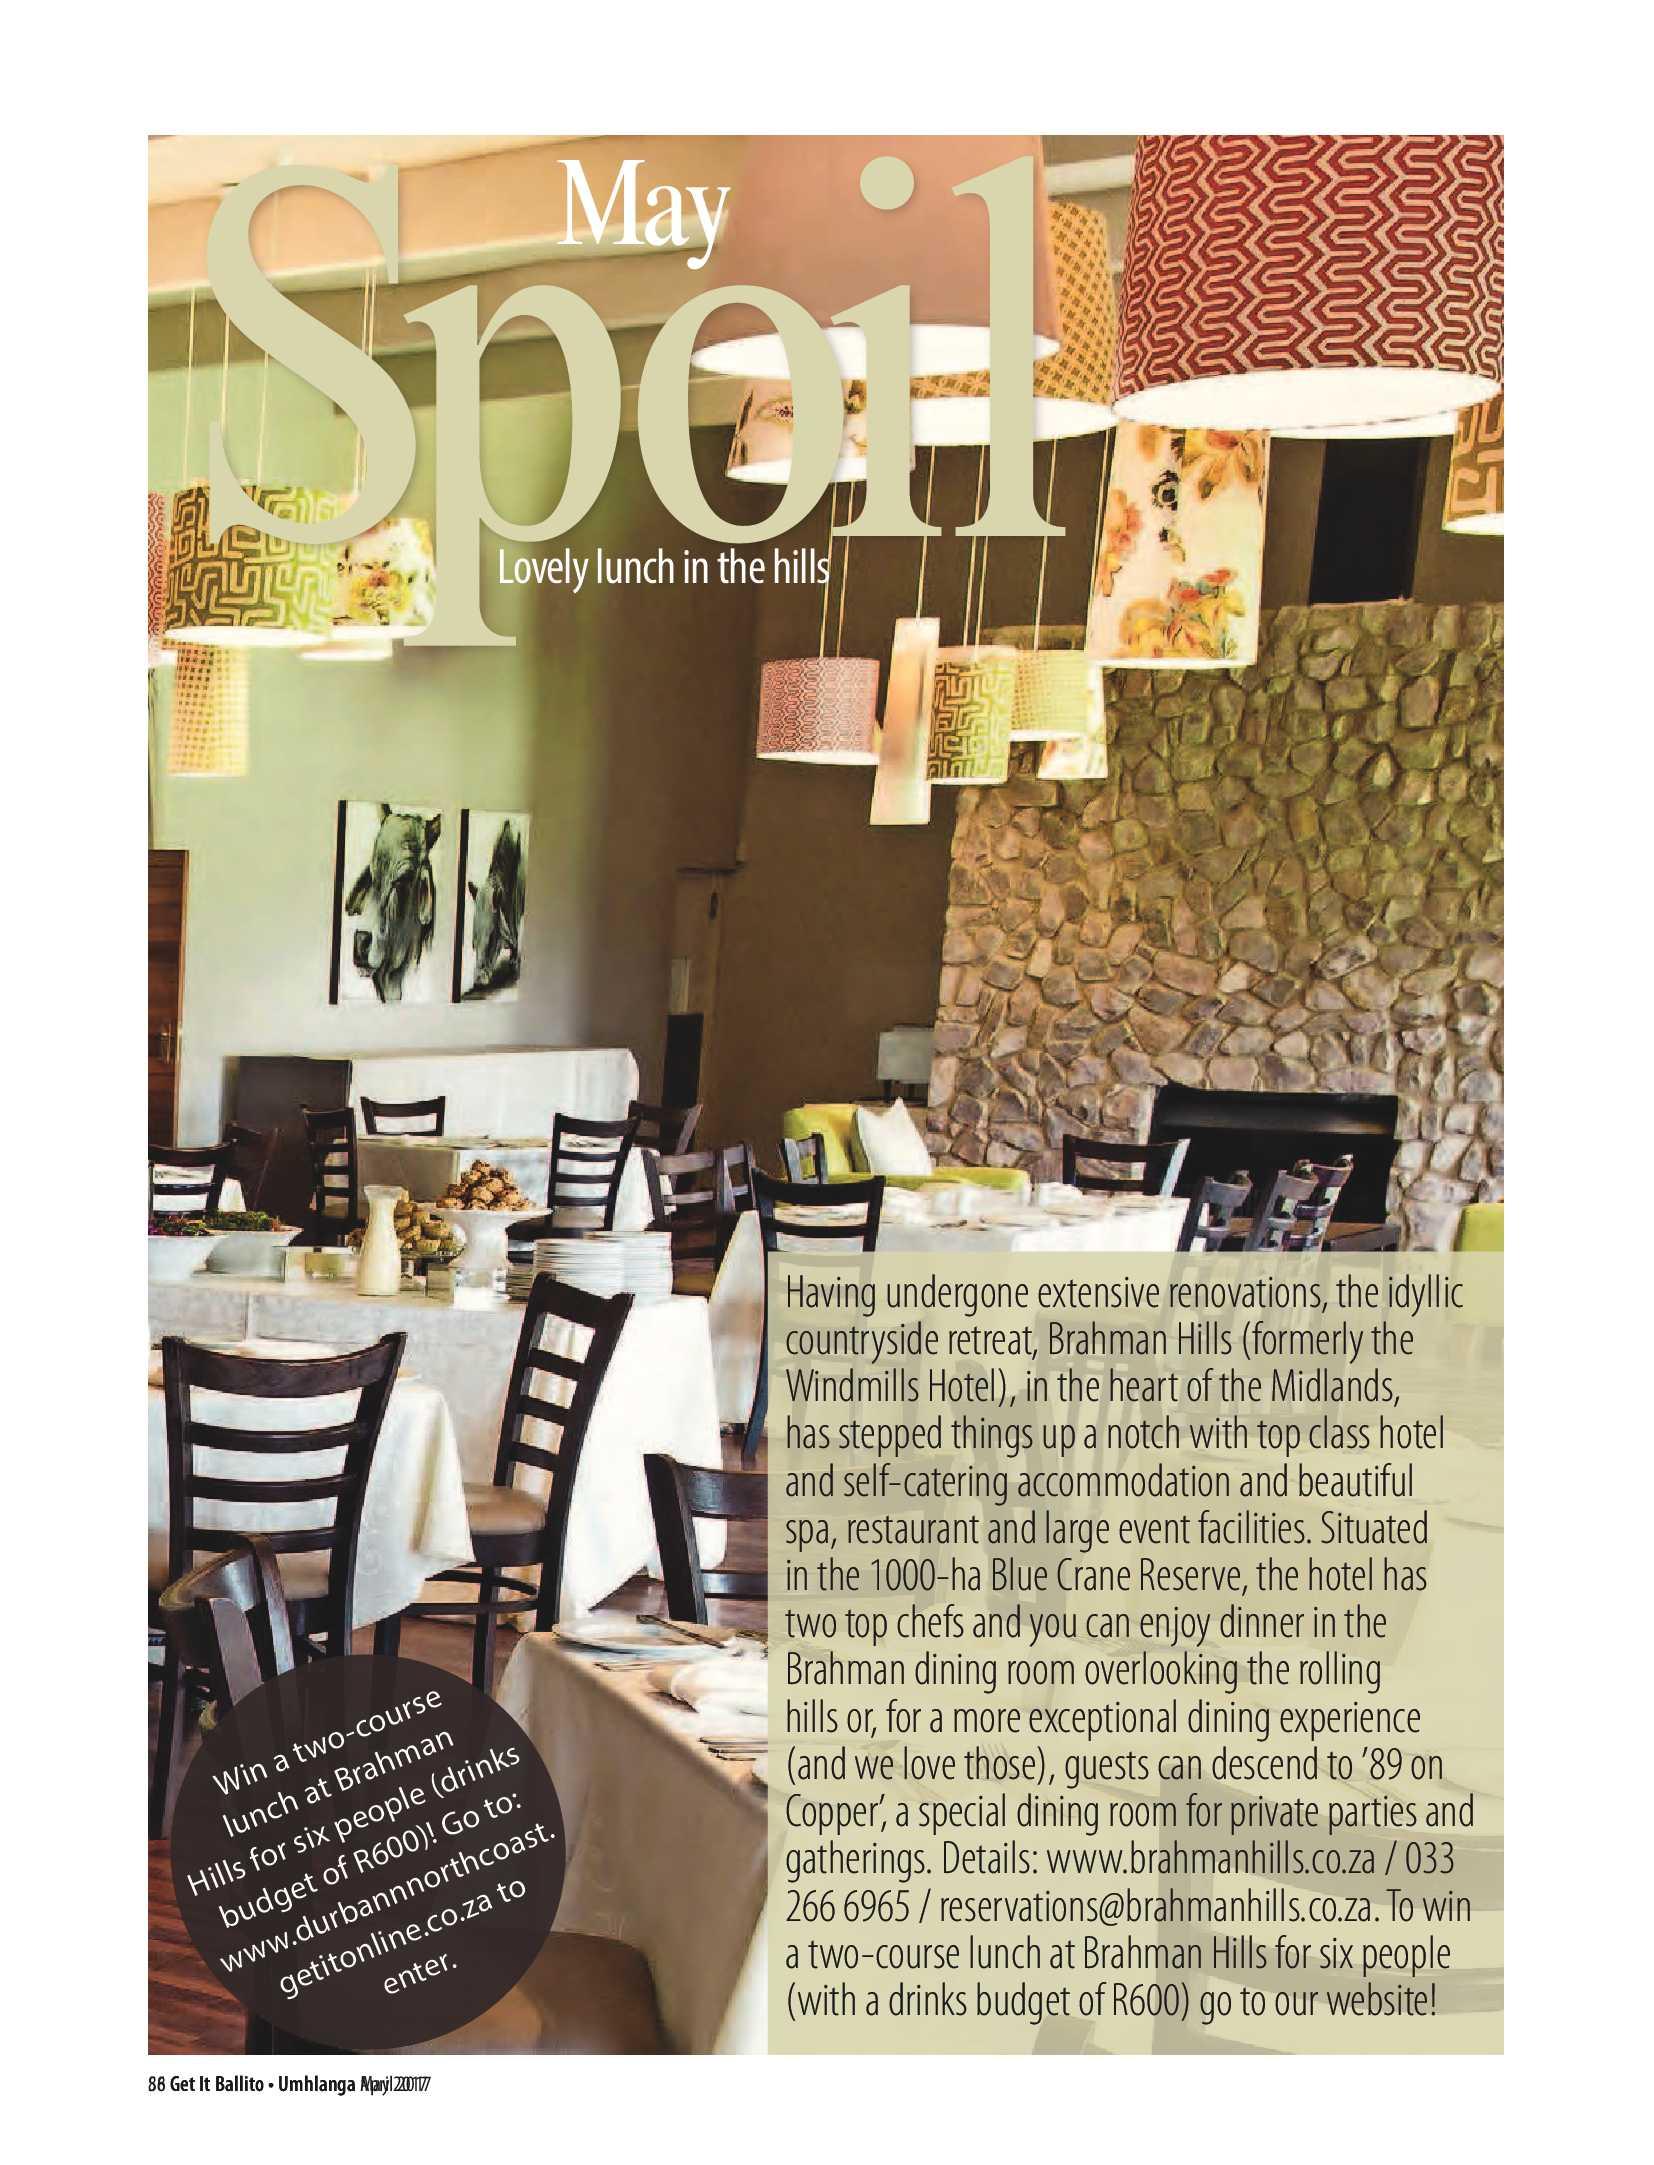 get-magazine-ballitoumhlanga-may-2017-epapers-page-58